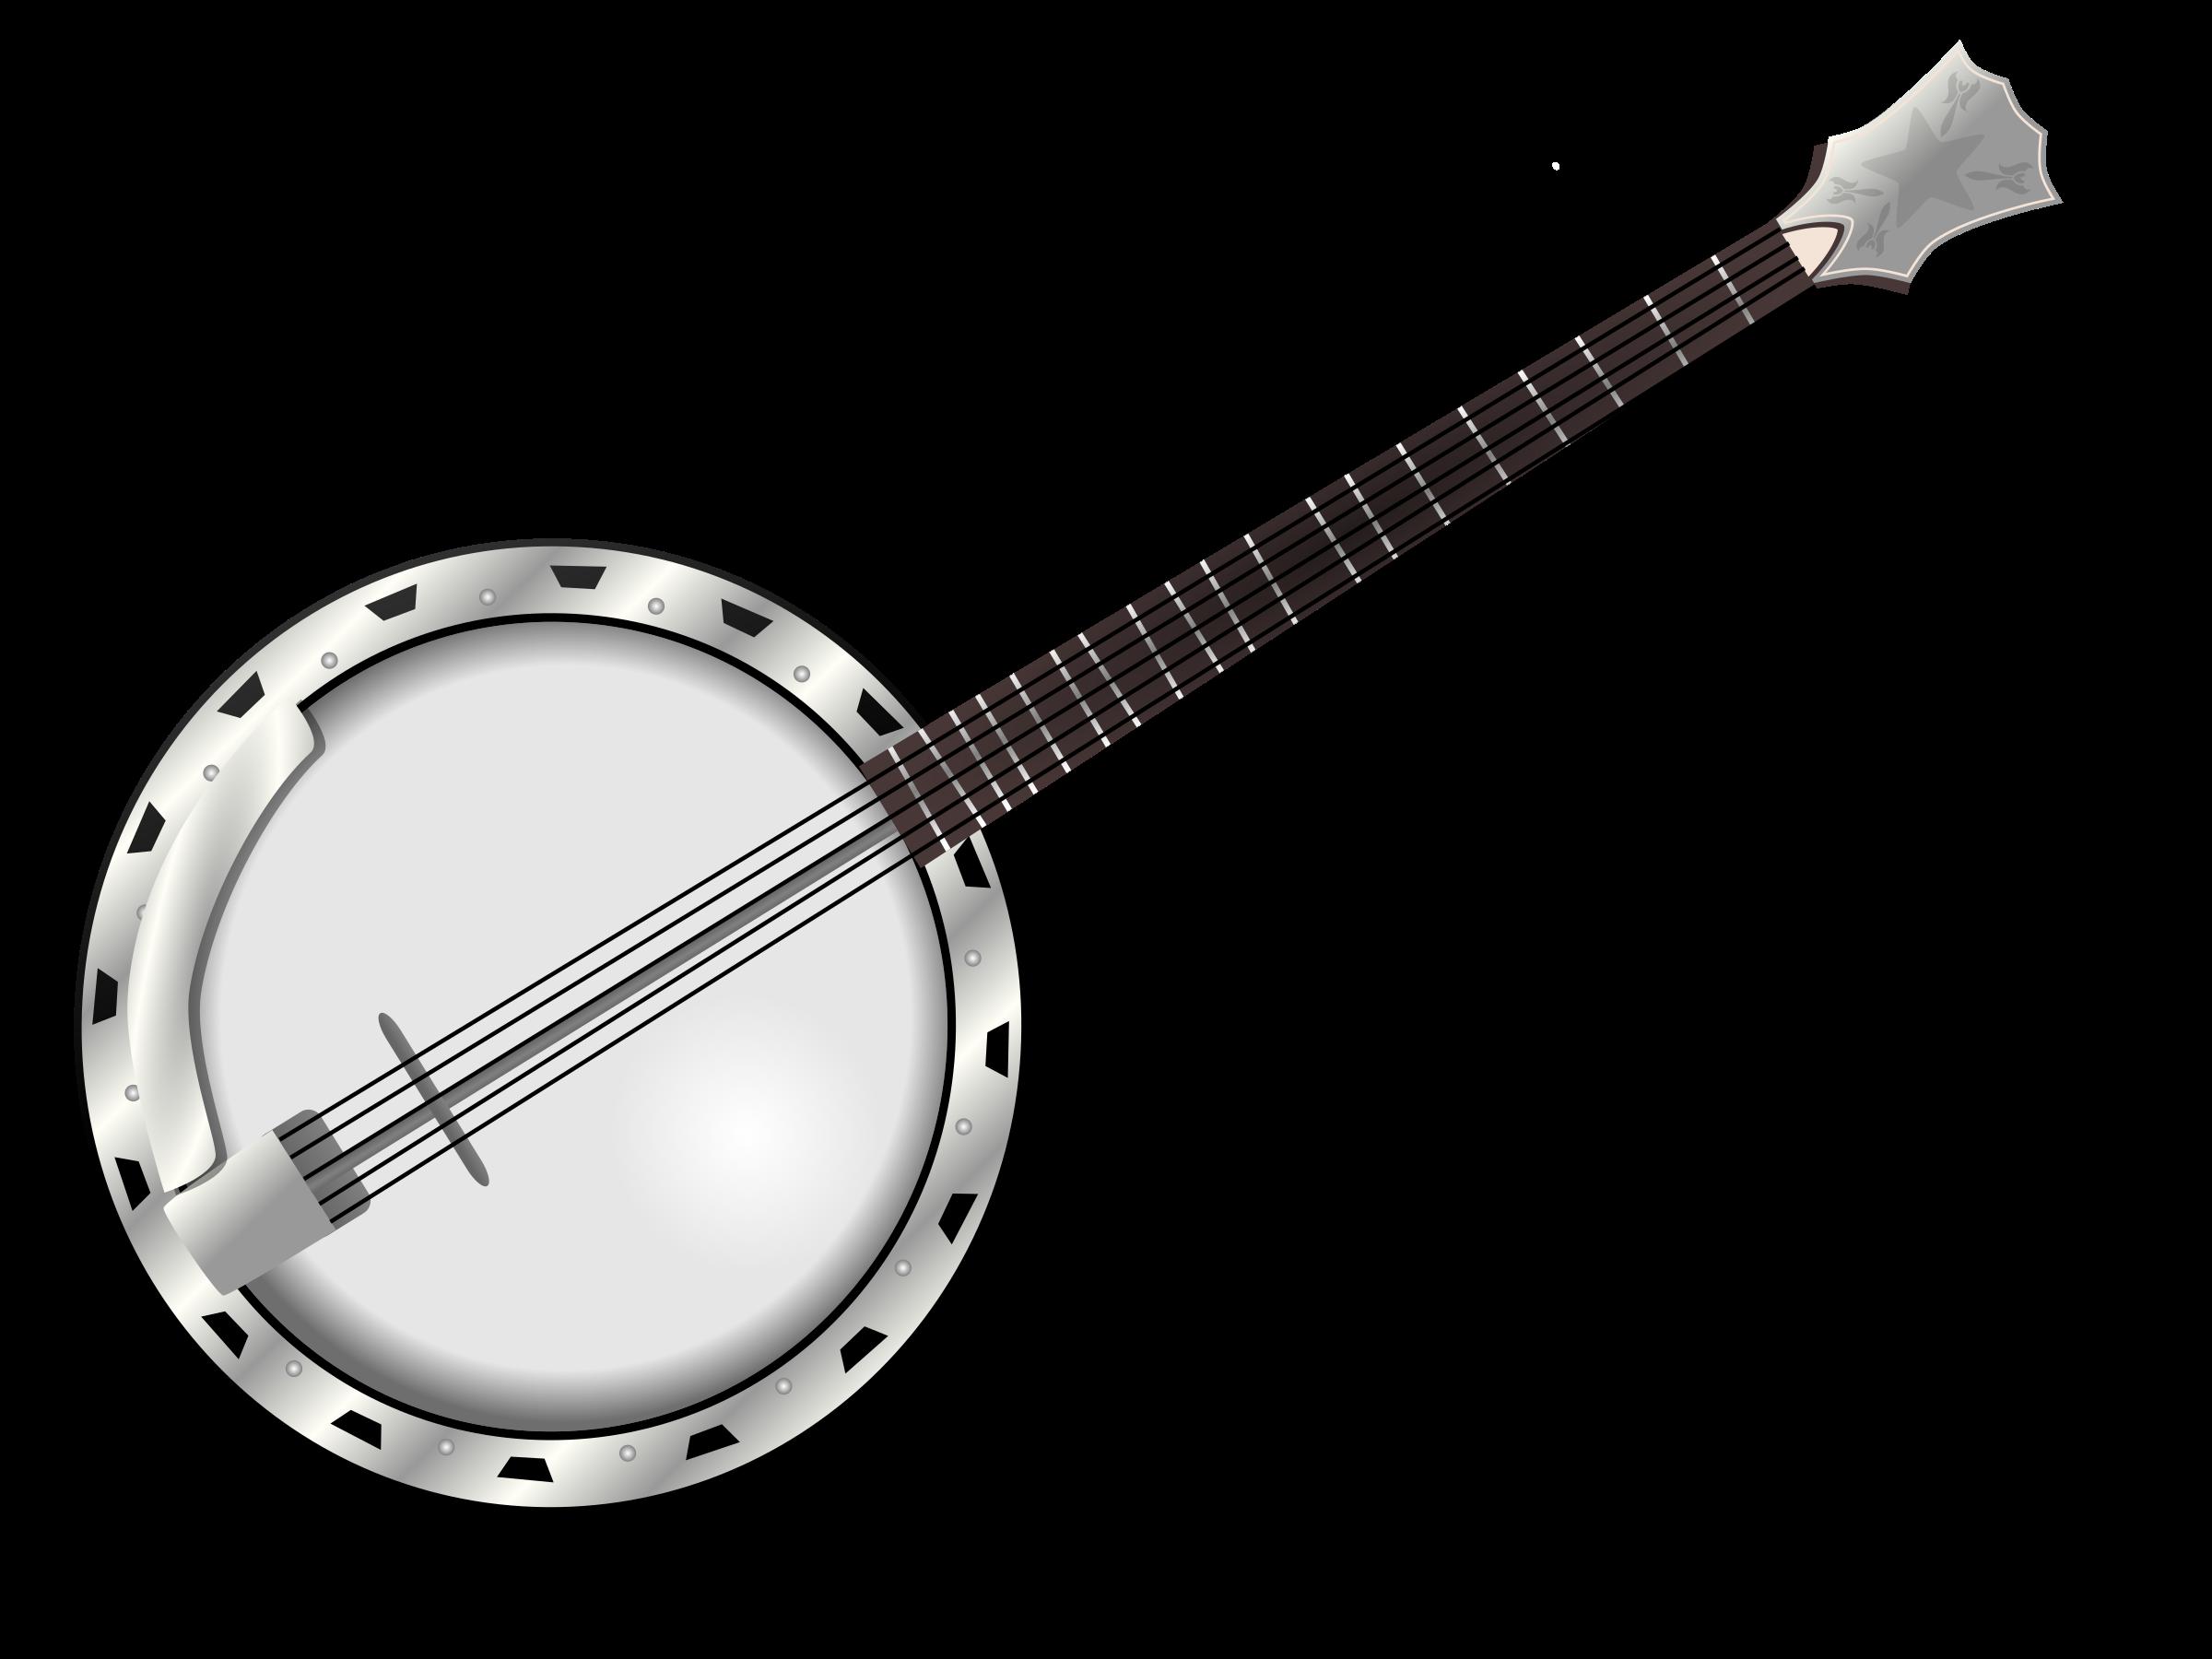 By gnokii cc music. Banjo clipart banjo guitar